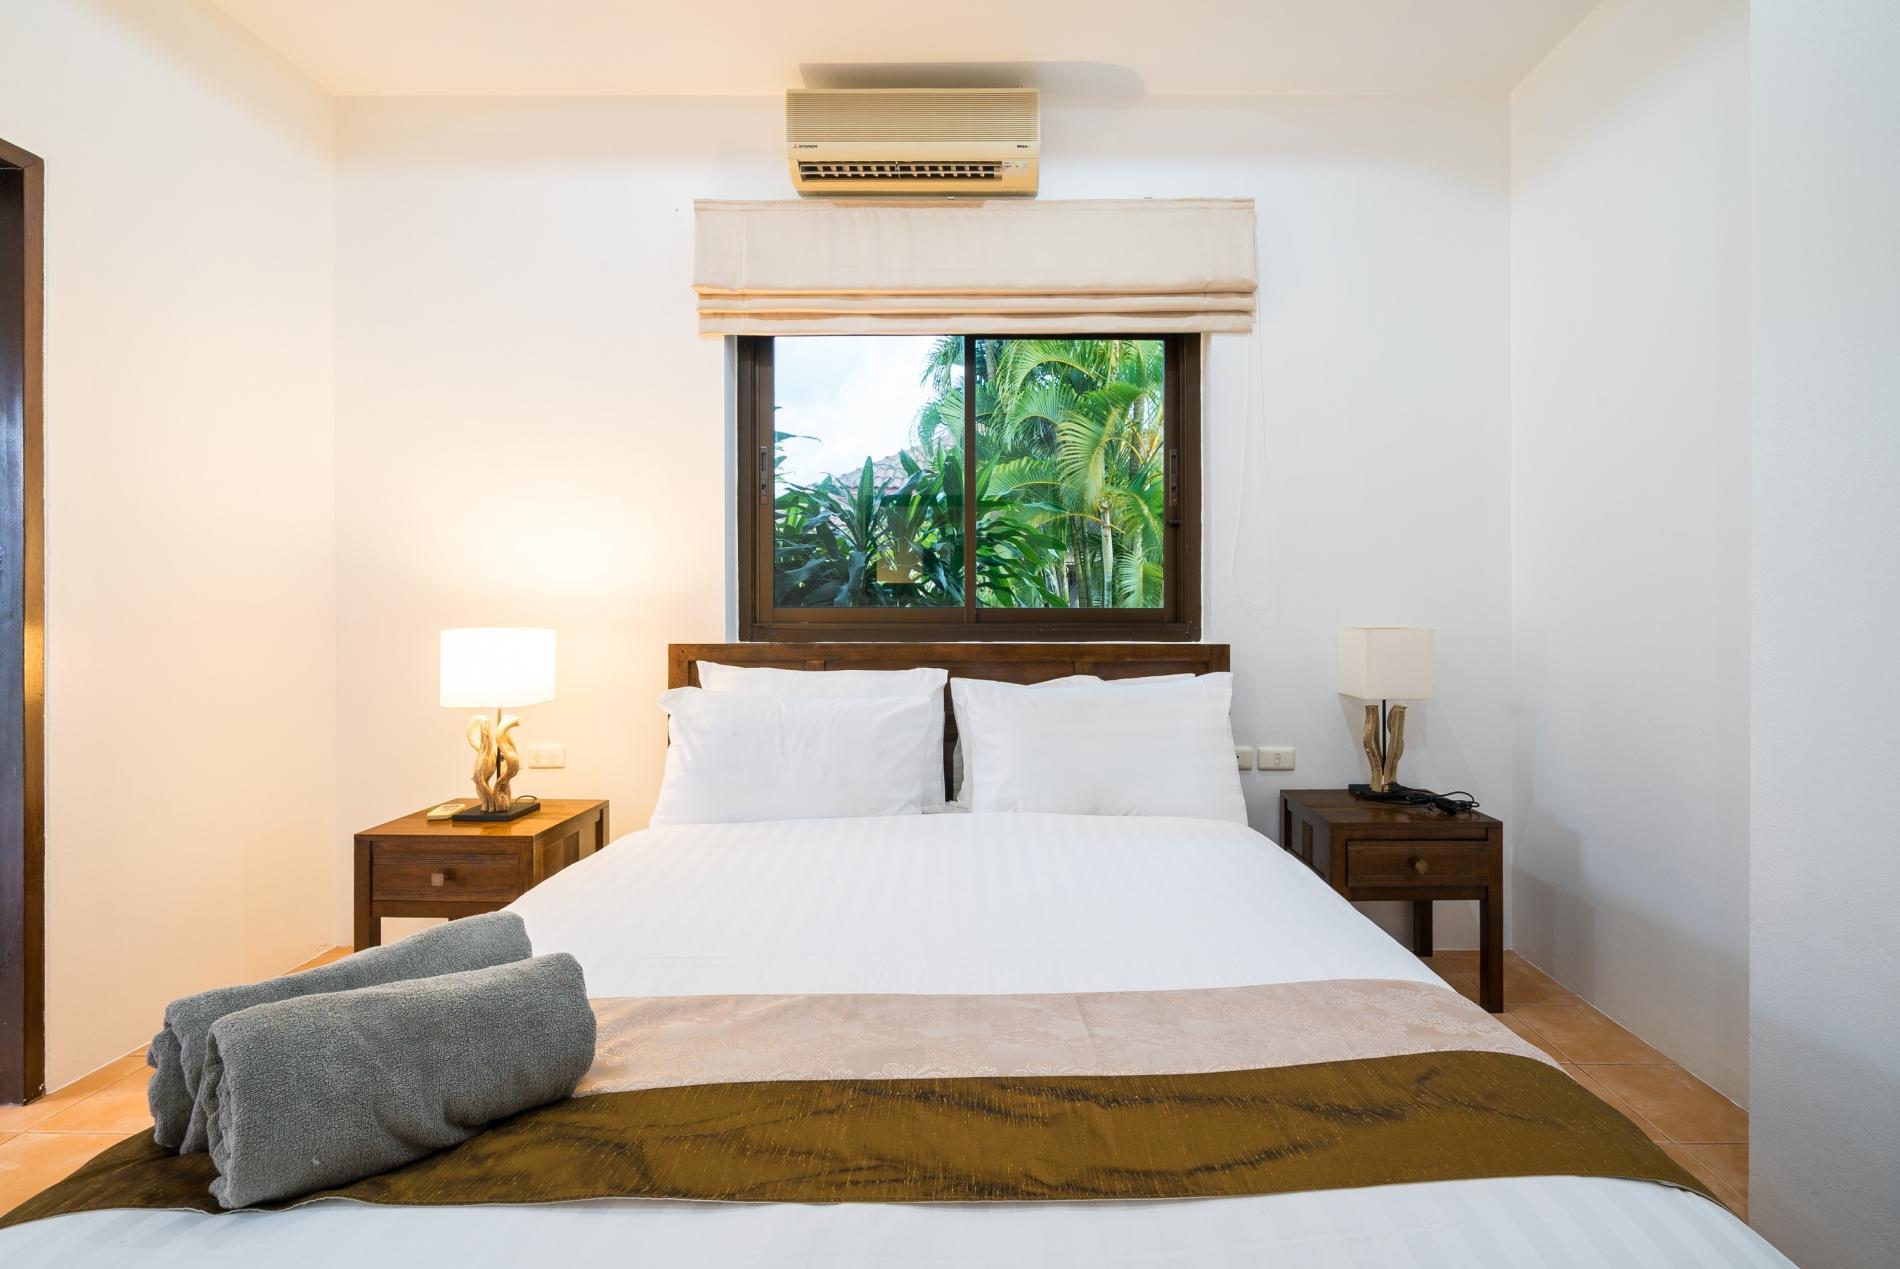 Apartment Pasak soi 3 - Convenient pool villa in quiet location  near Laguna  Boat avenue photo 19552928